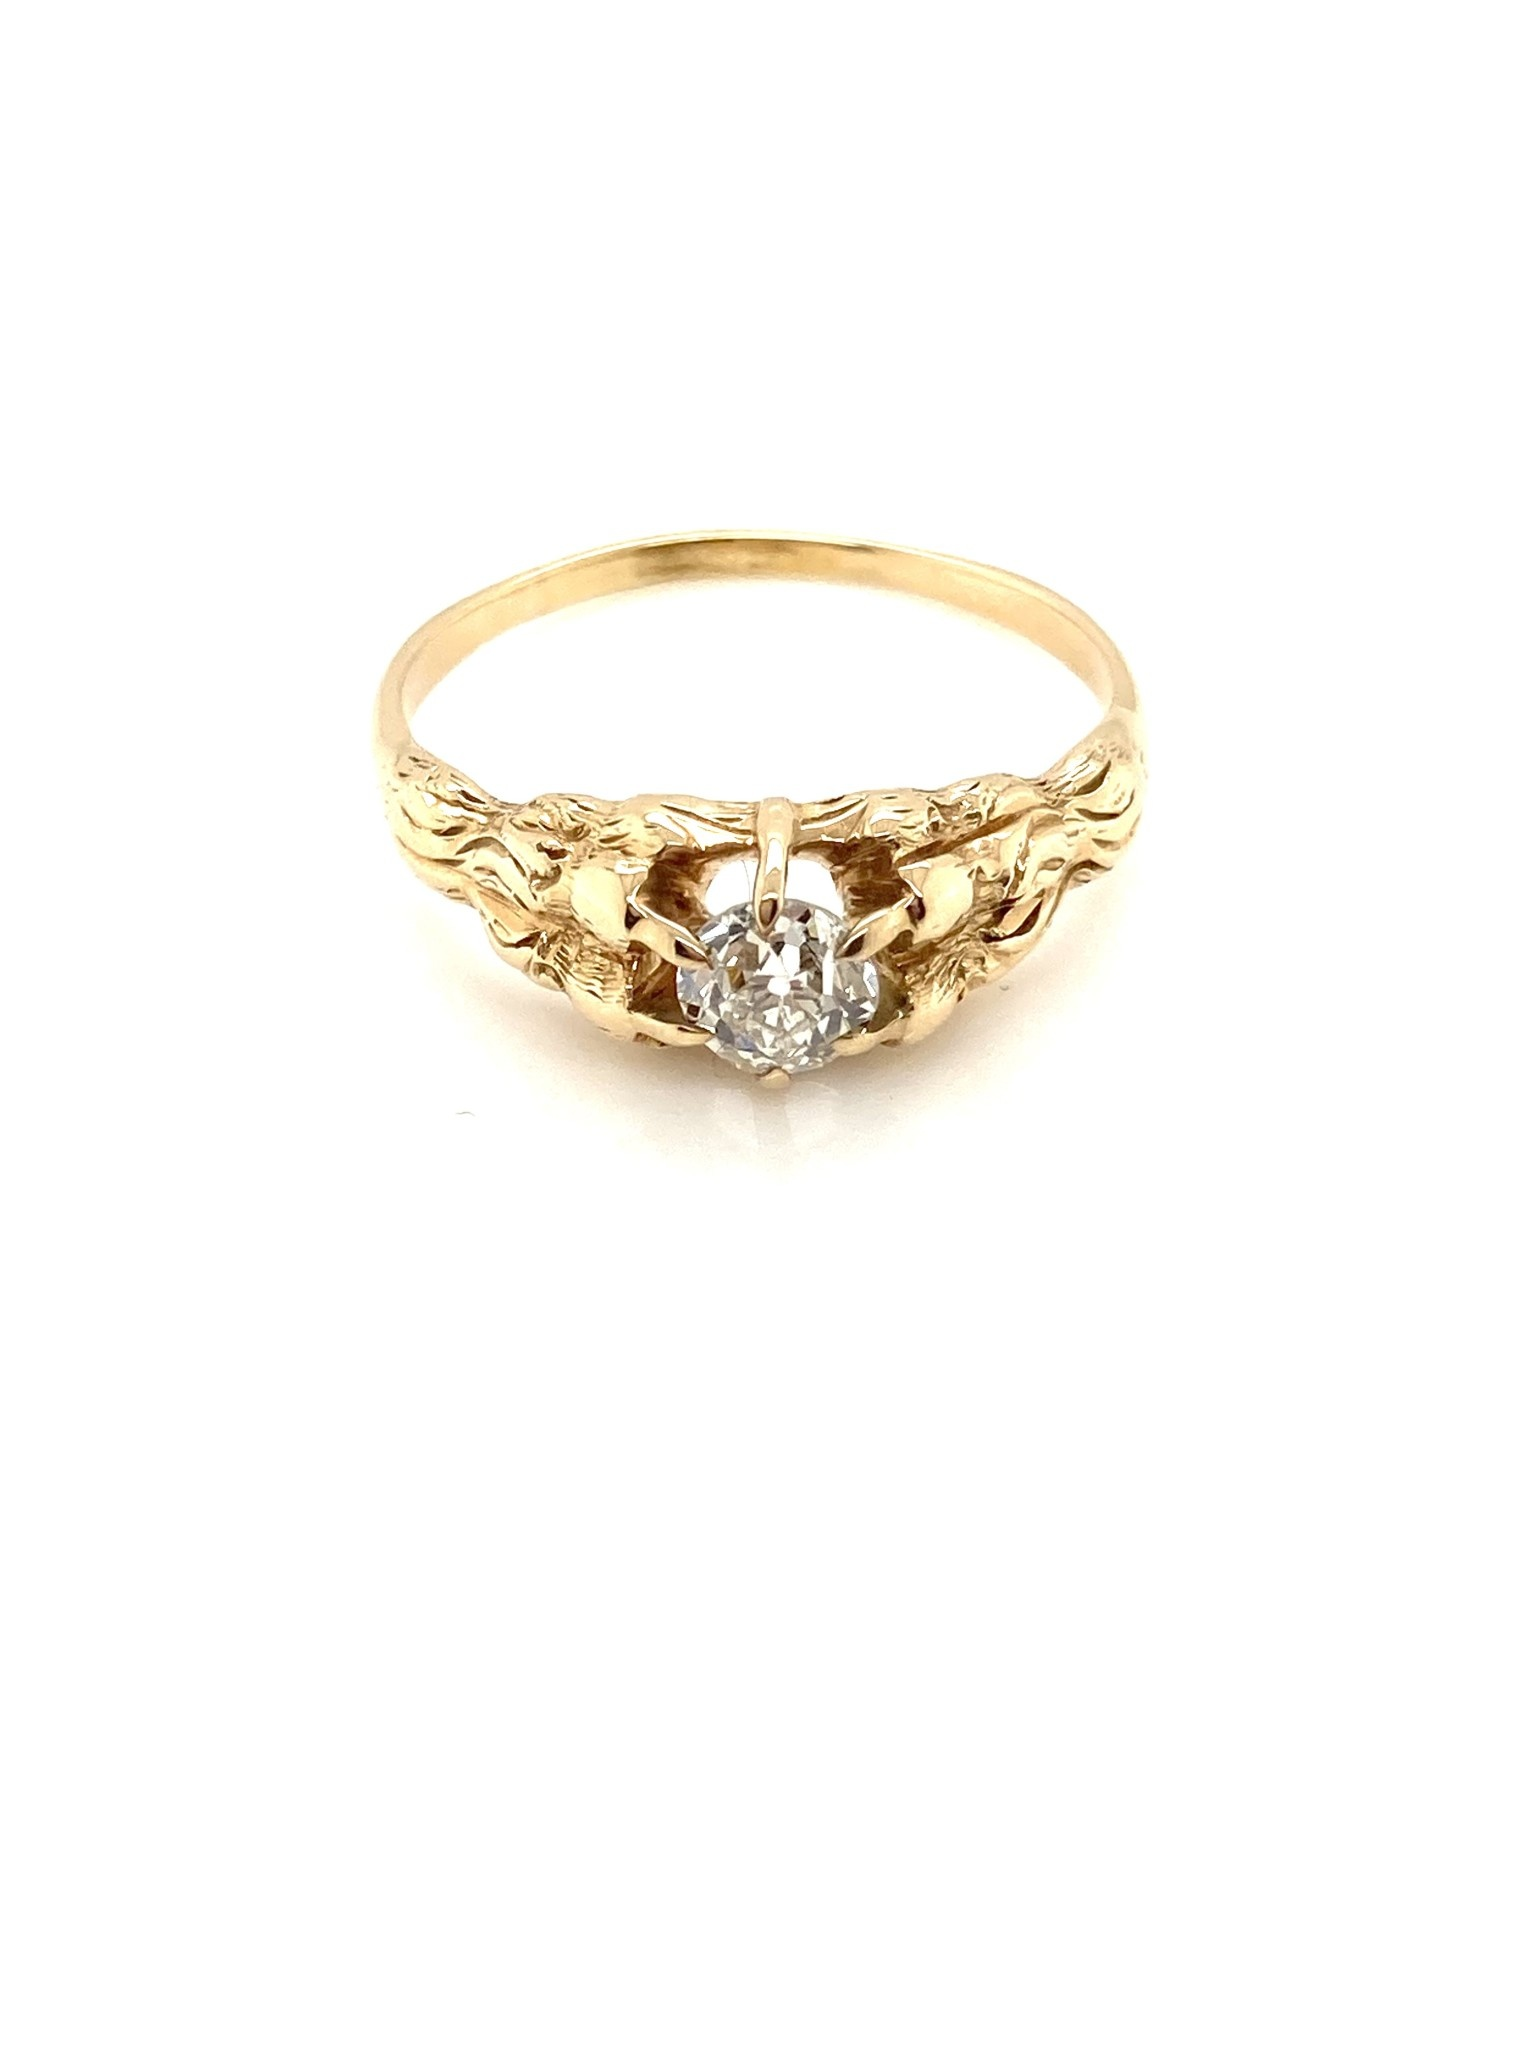 14K Yellow Gold Old Euro Diamond, Tree Bark Style Ring